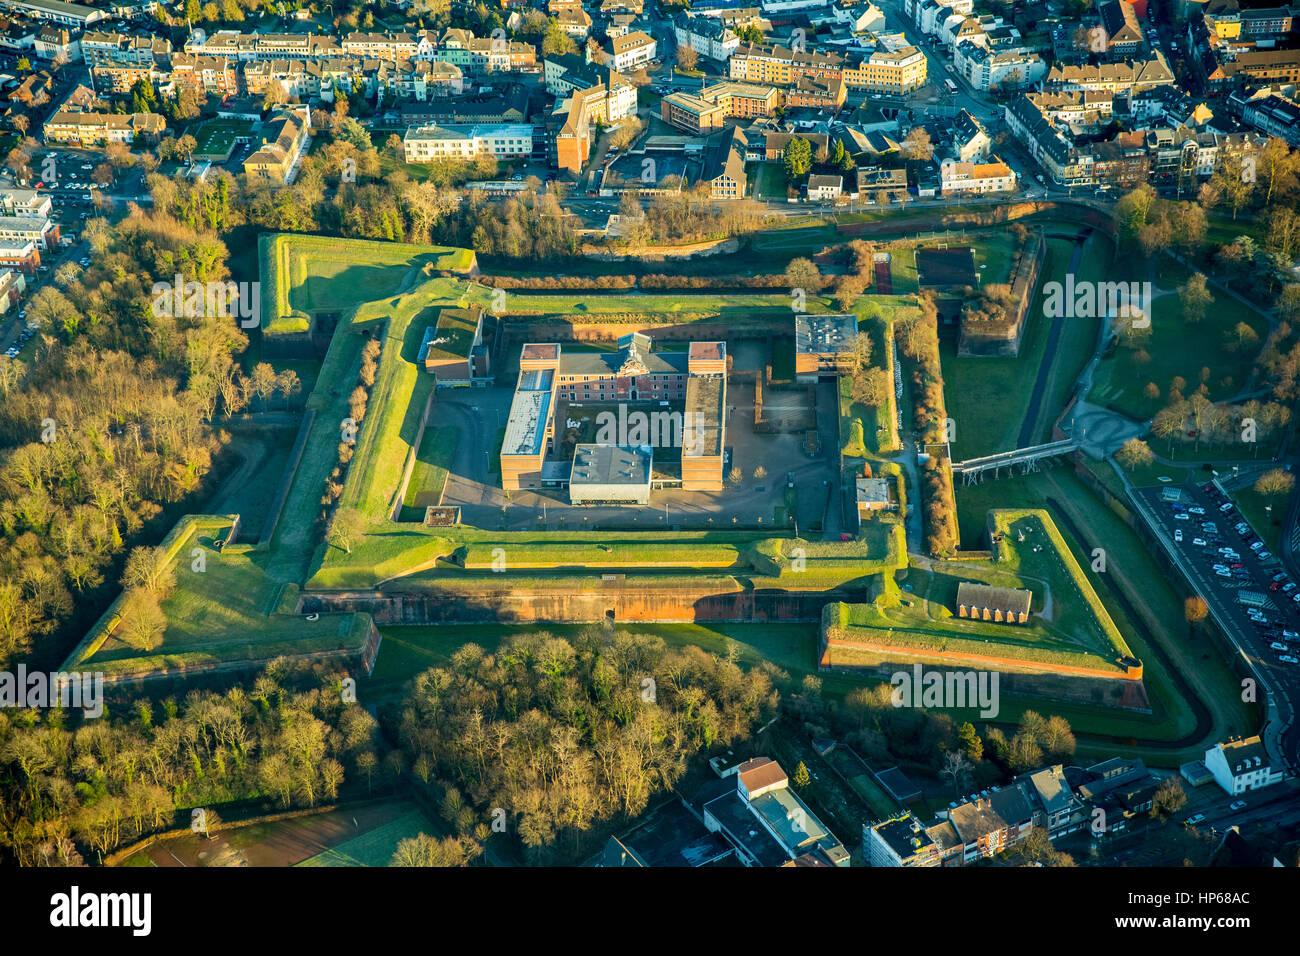 Renaissance castle, inside, the mighty citadel Jülich, medieval defenses, Jülich, Rhineland, North Rhine - Stock Image